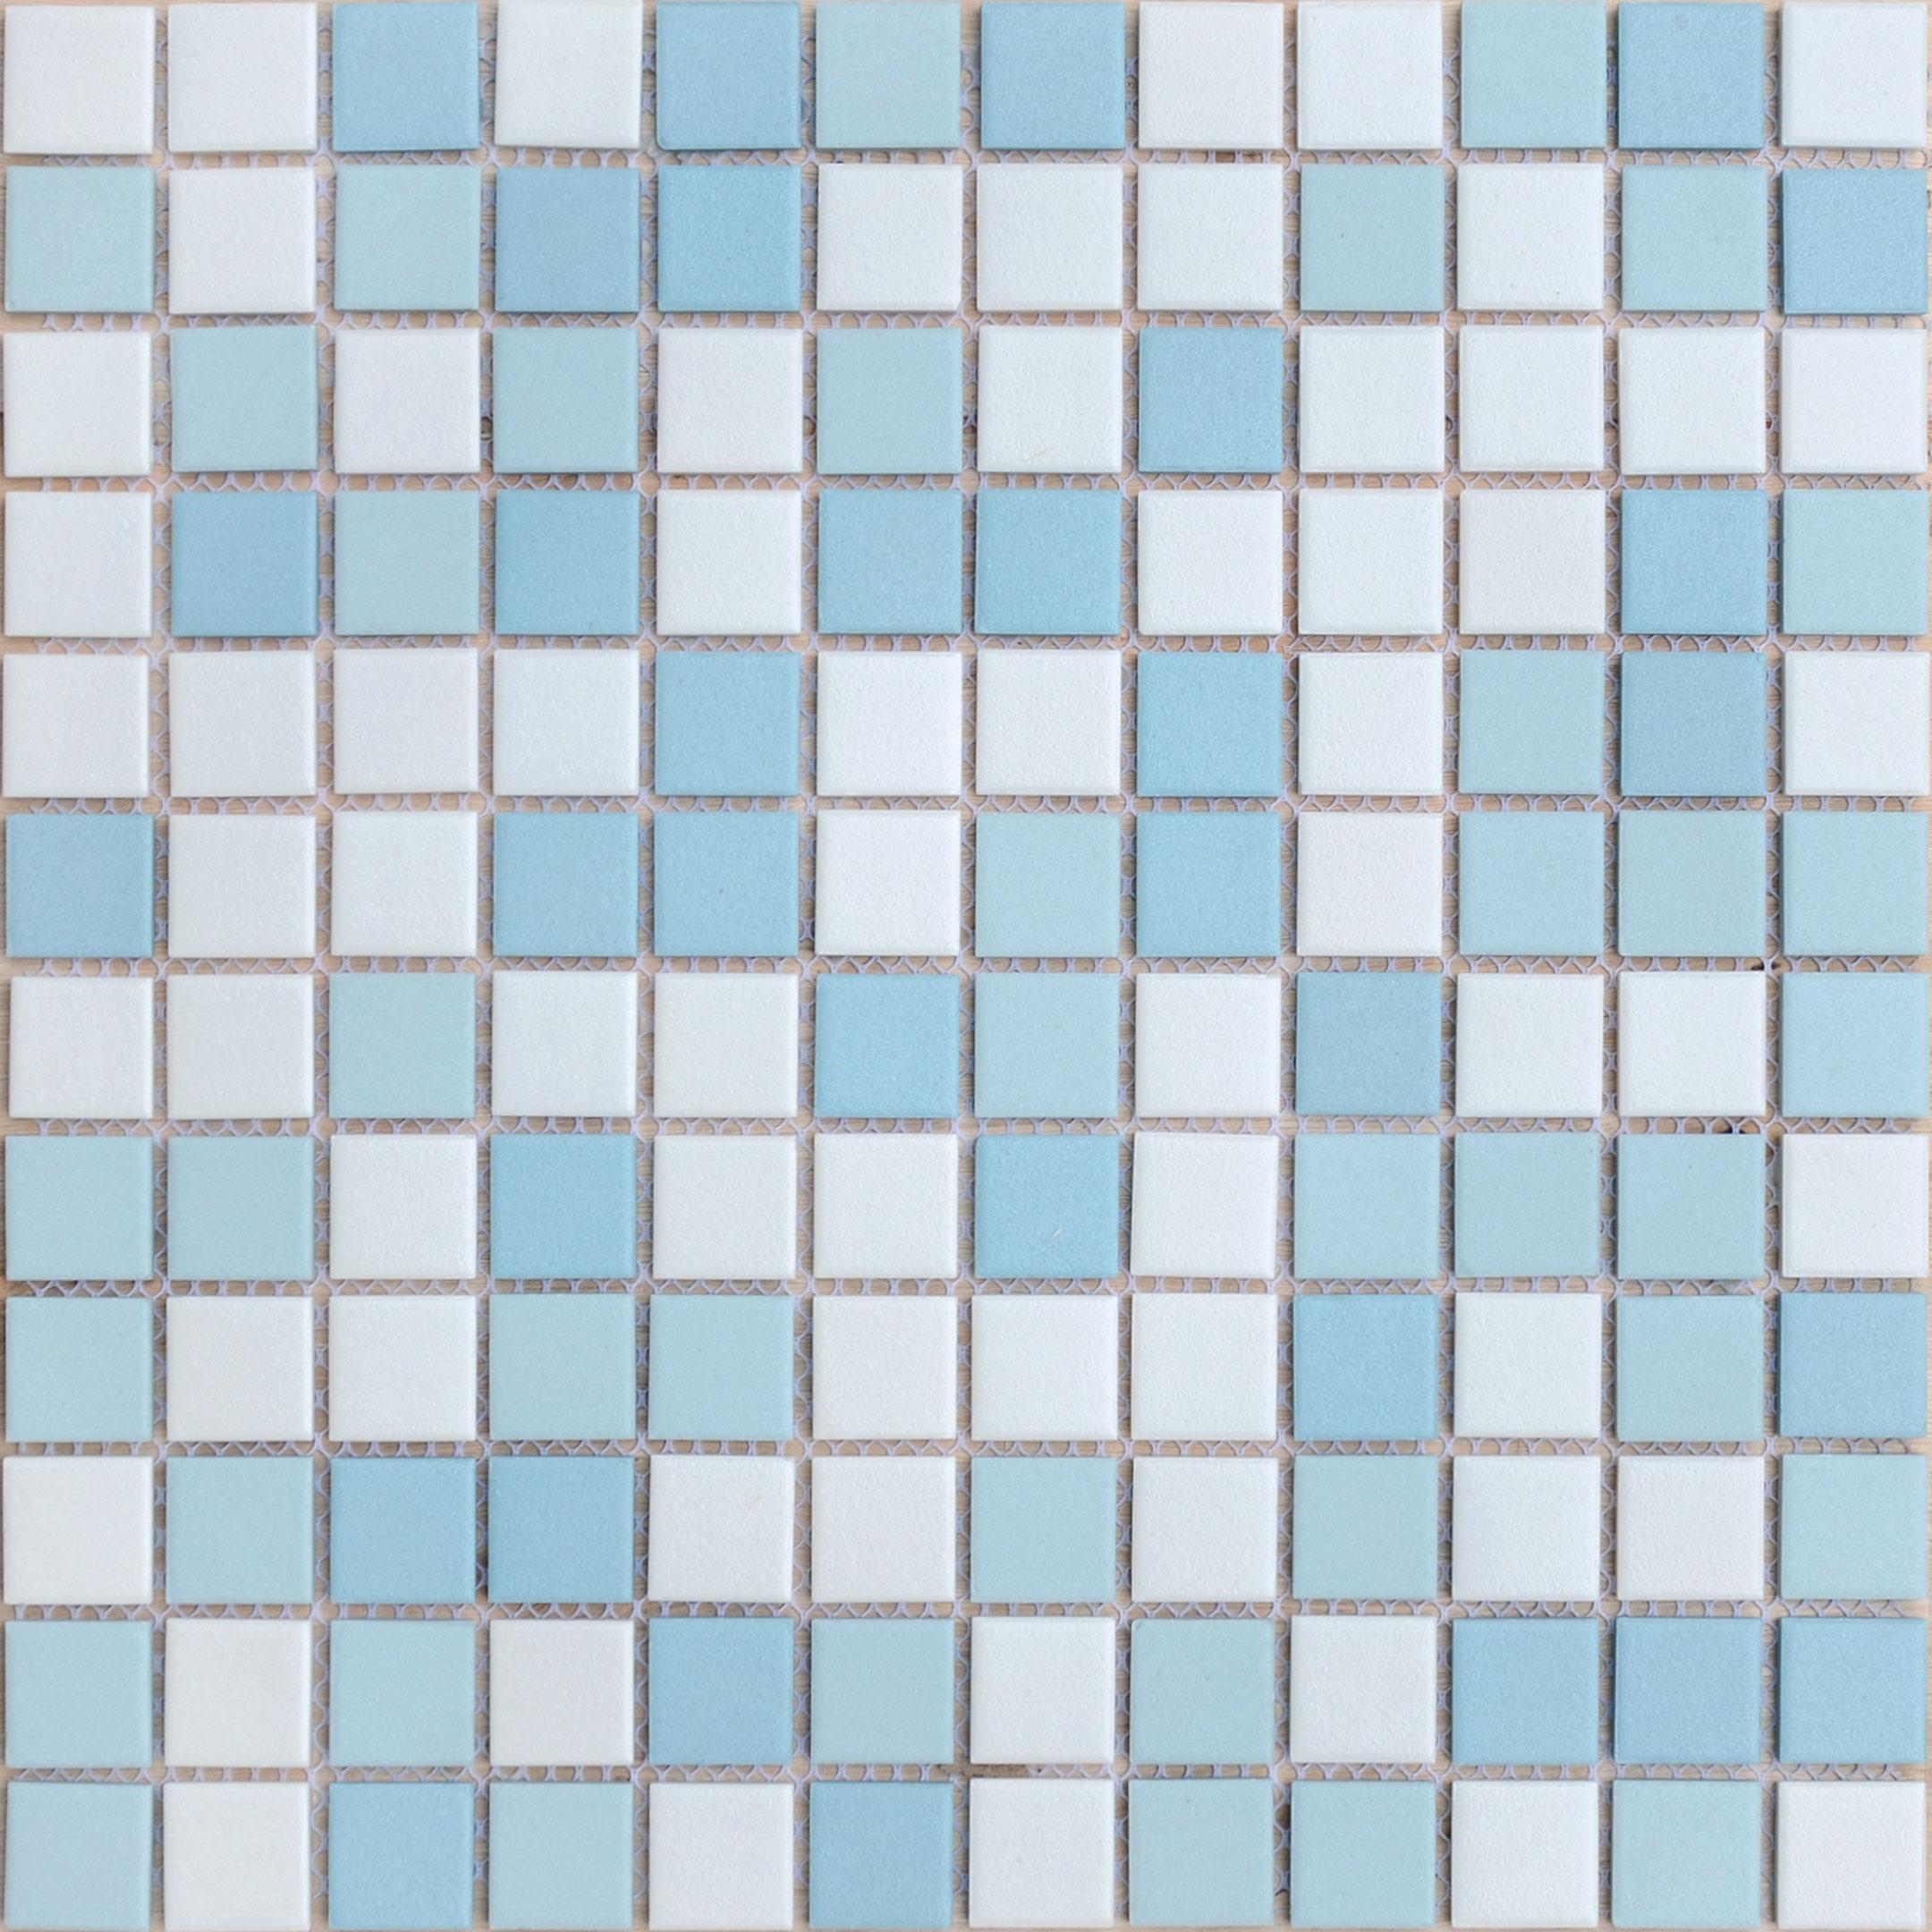 Мозаика Caramelle Uranio микс голубой из керамогранита 300х300х6 мм